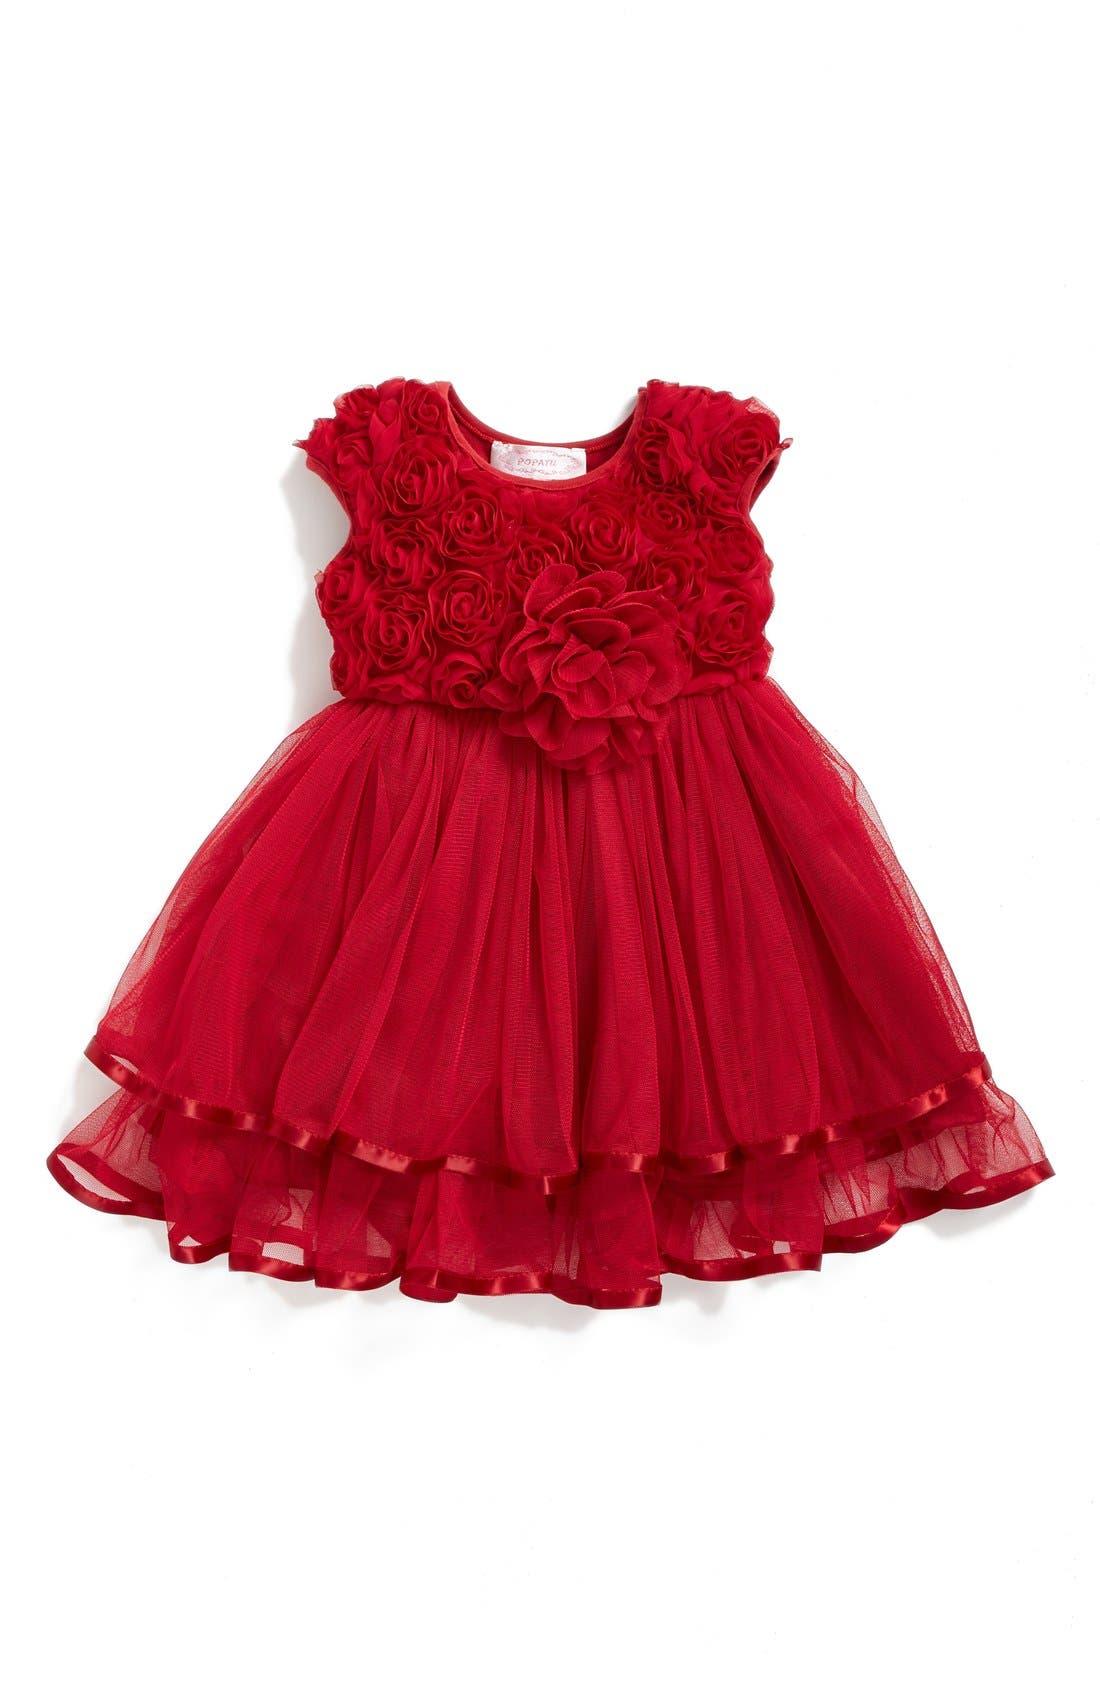 Rosette Tulle Dress,                         Main,                         color, RED